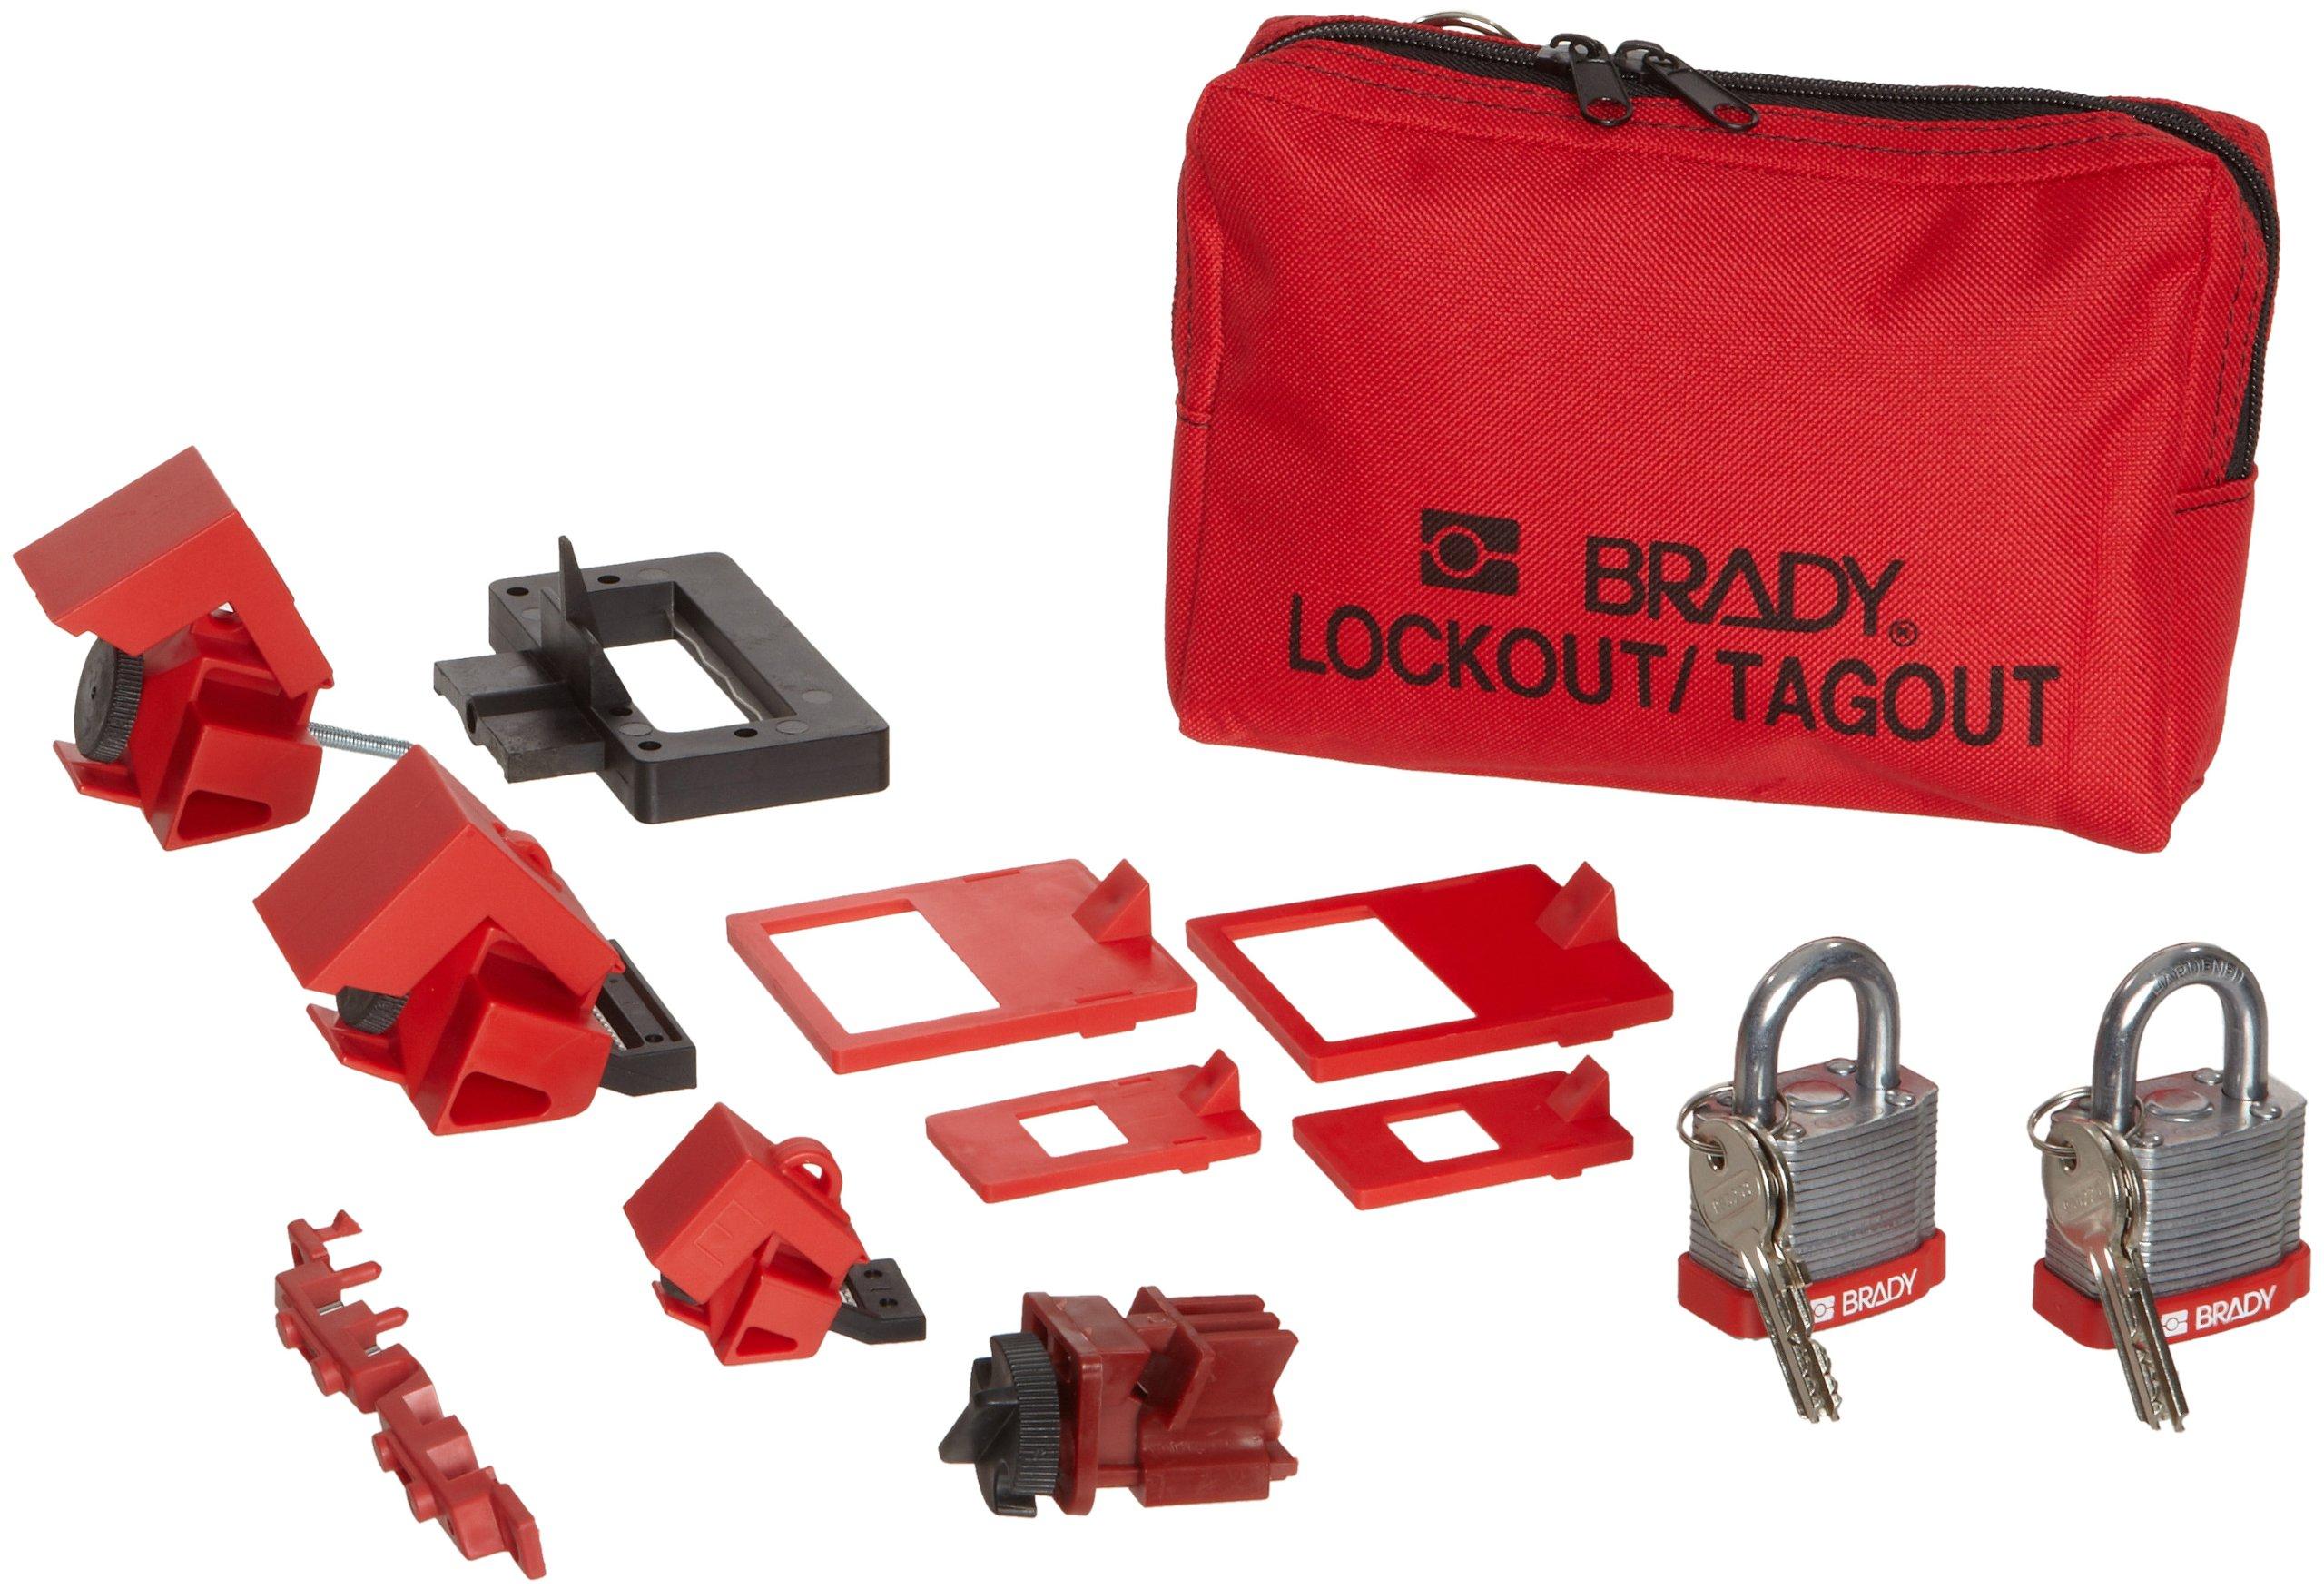 Brady Breaker Lockout Pouch Kit, Includes 2 Steel Padlocks and 2 Tags by Brady